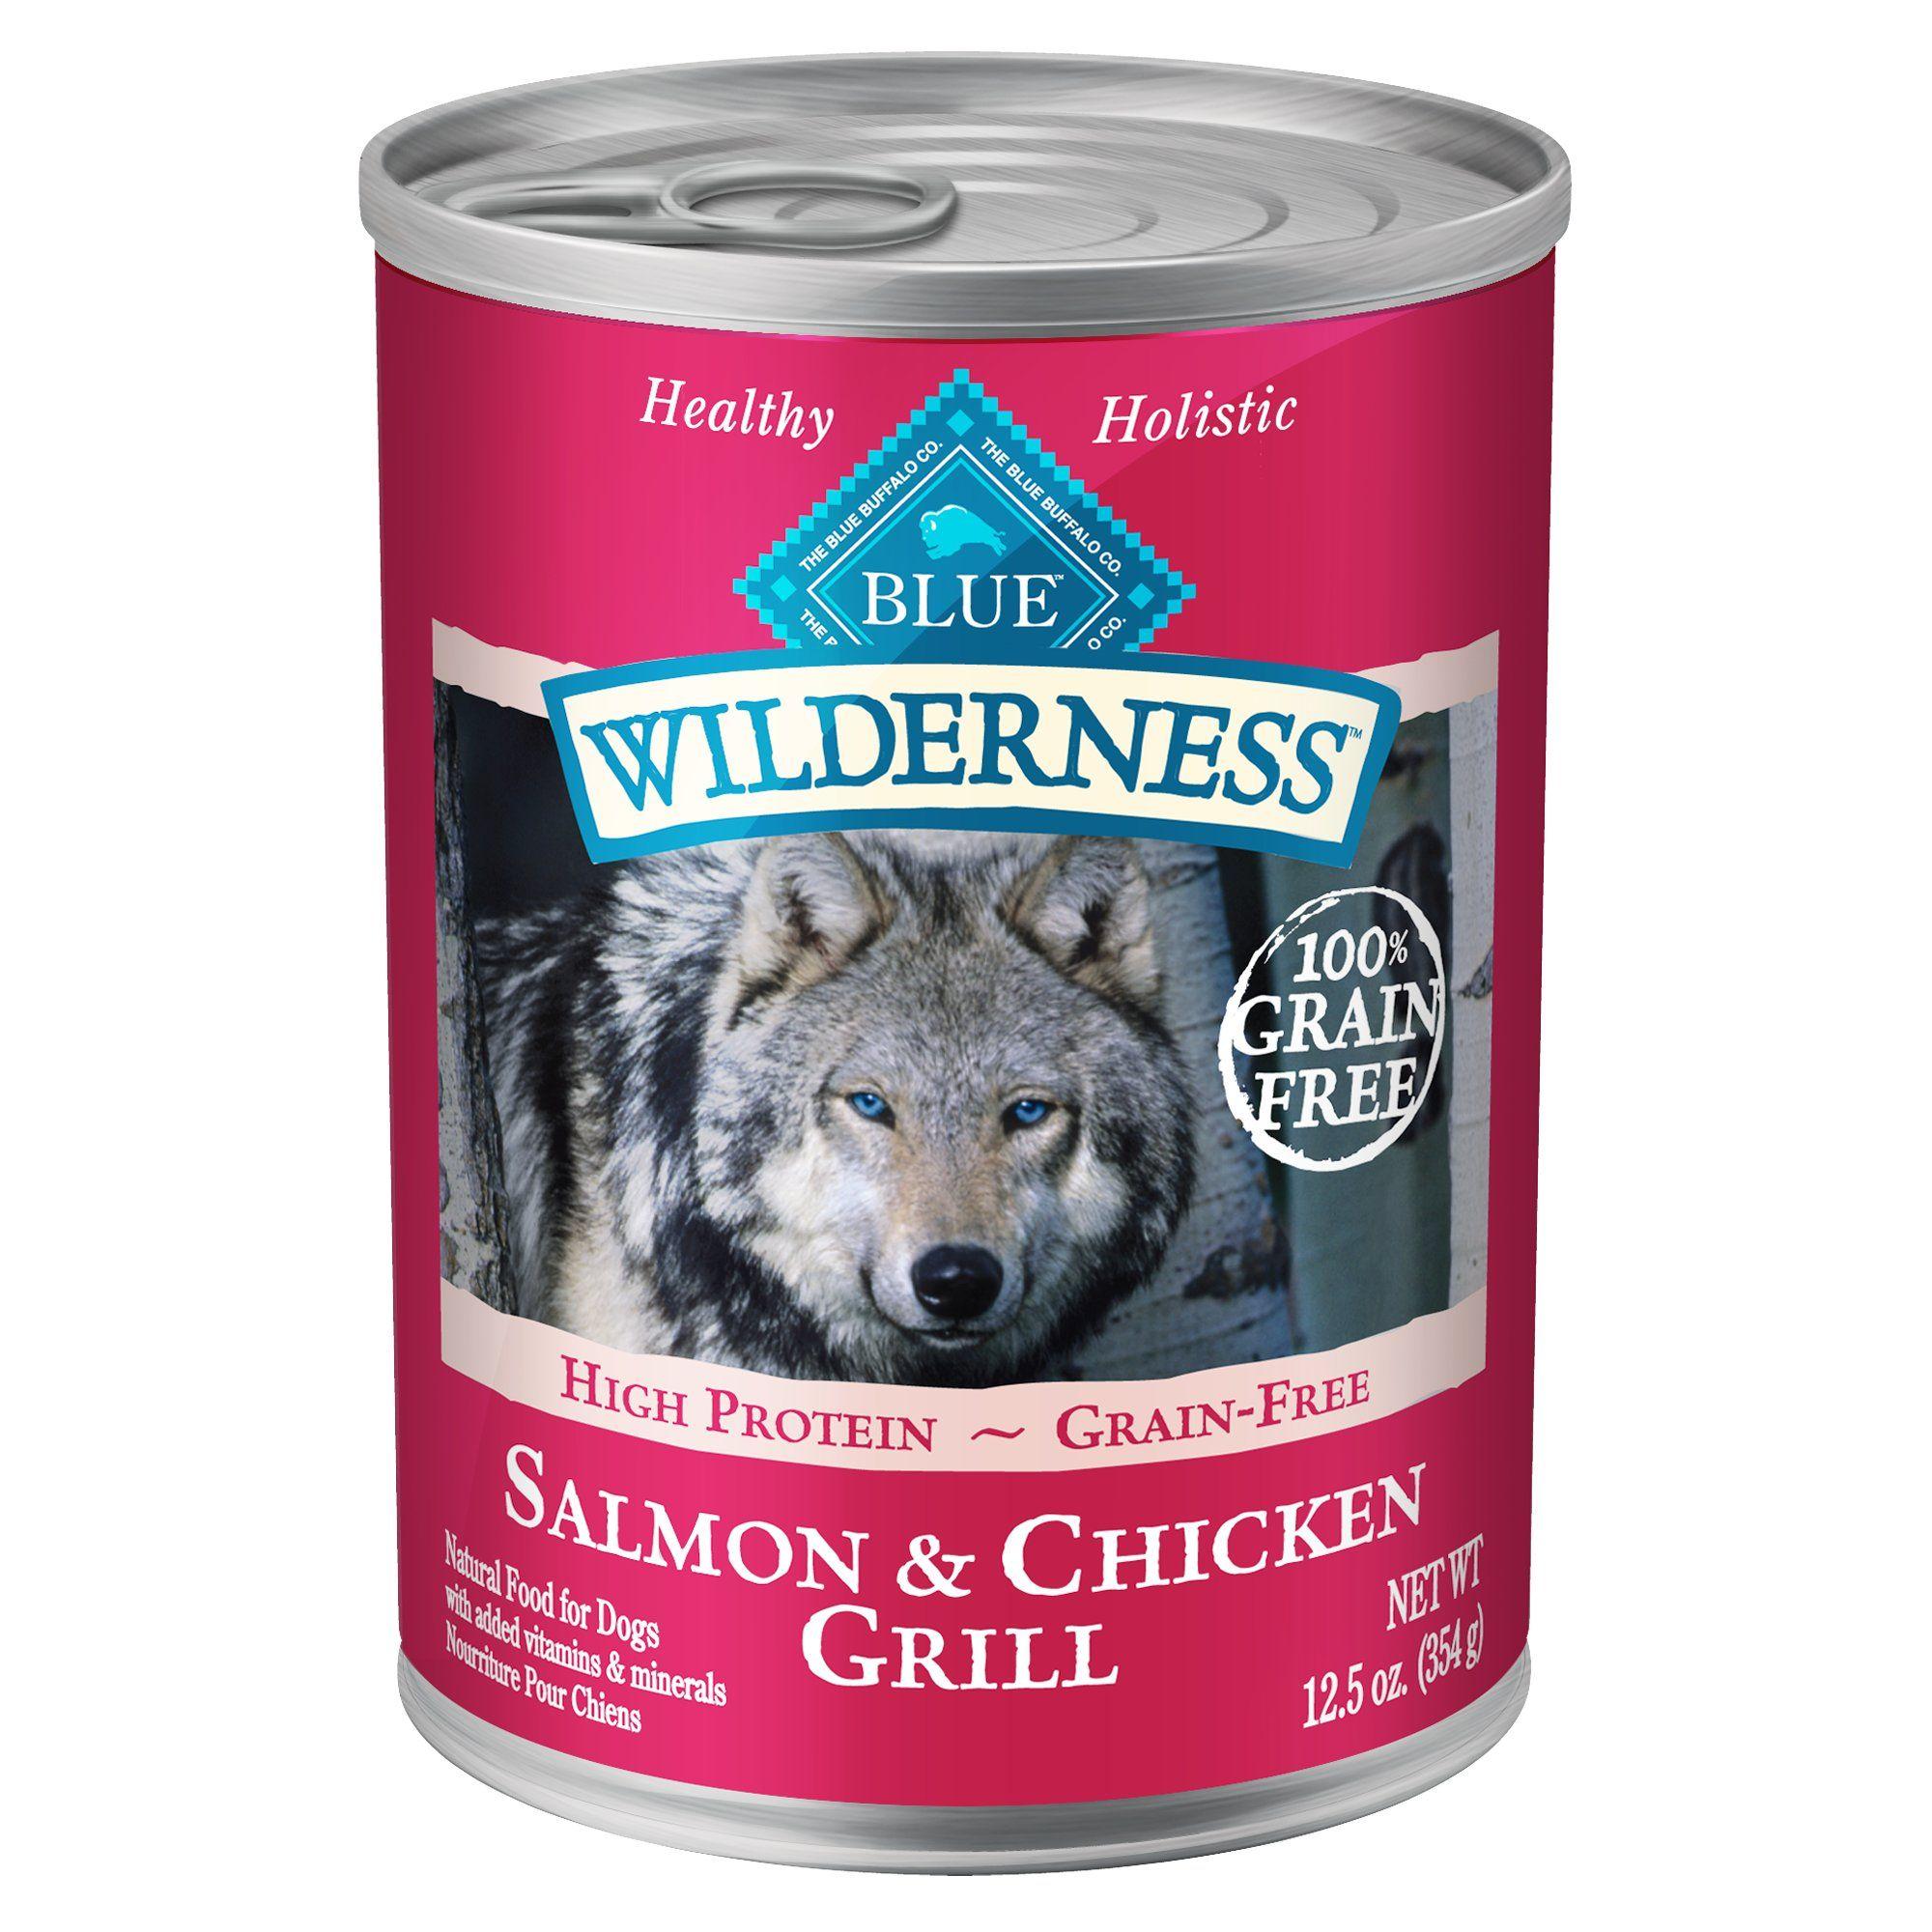 Blue Buffalo Blue Wilderness Salmon Chicken Grill Wet Dog Food